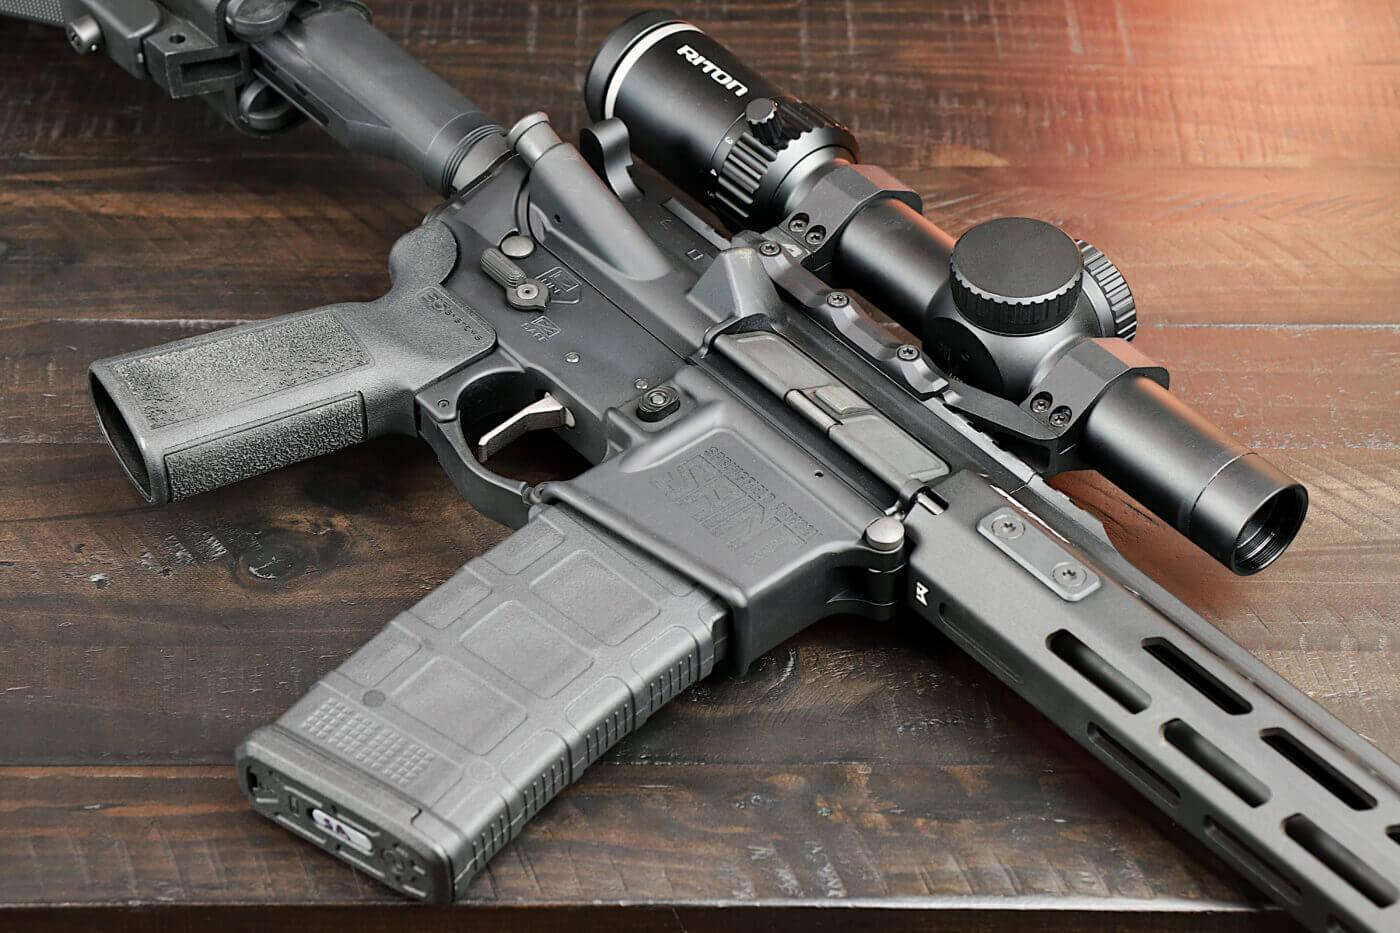 Riton 3 Tactix 1-8X scope mounted on SAINT Victor rifle